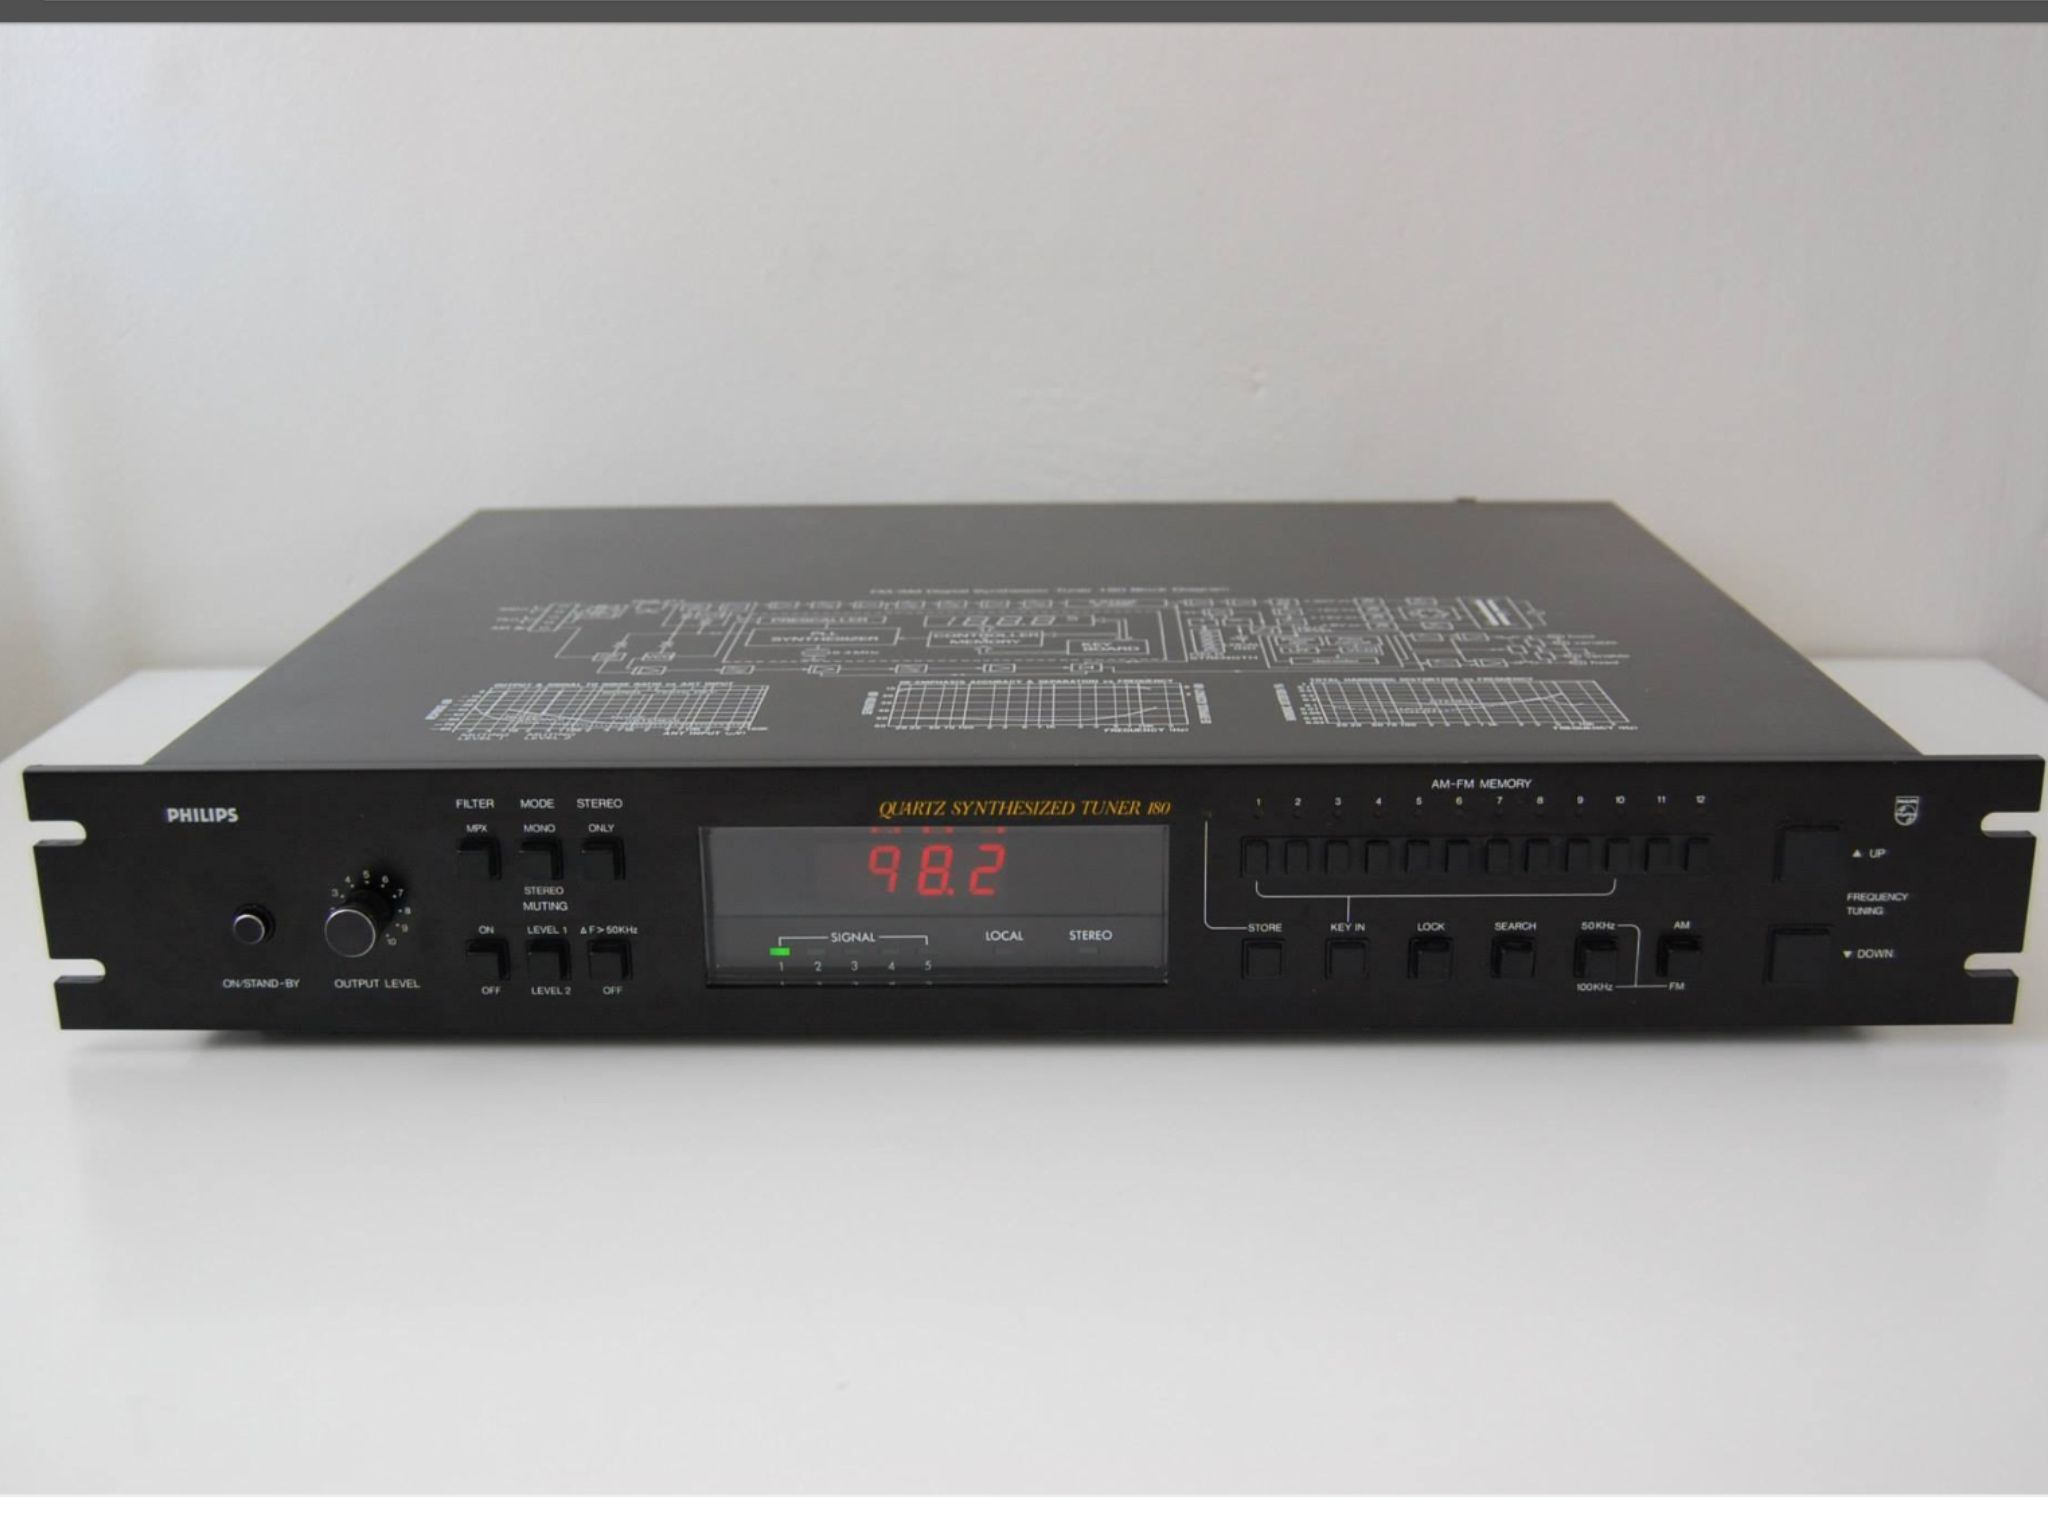 Sansui TU-S9 vs Hitachi FT-5500 vs Rotel RT-950BX Fecbca25de66541baed99a0a46ceb762